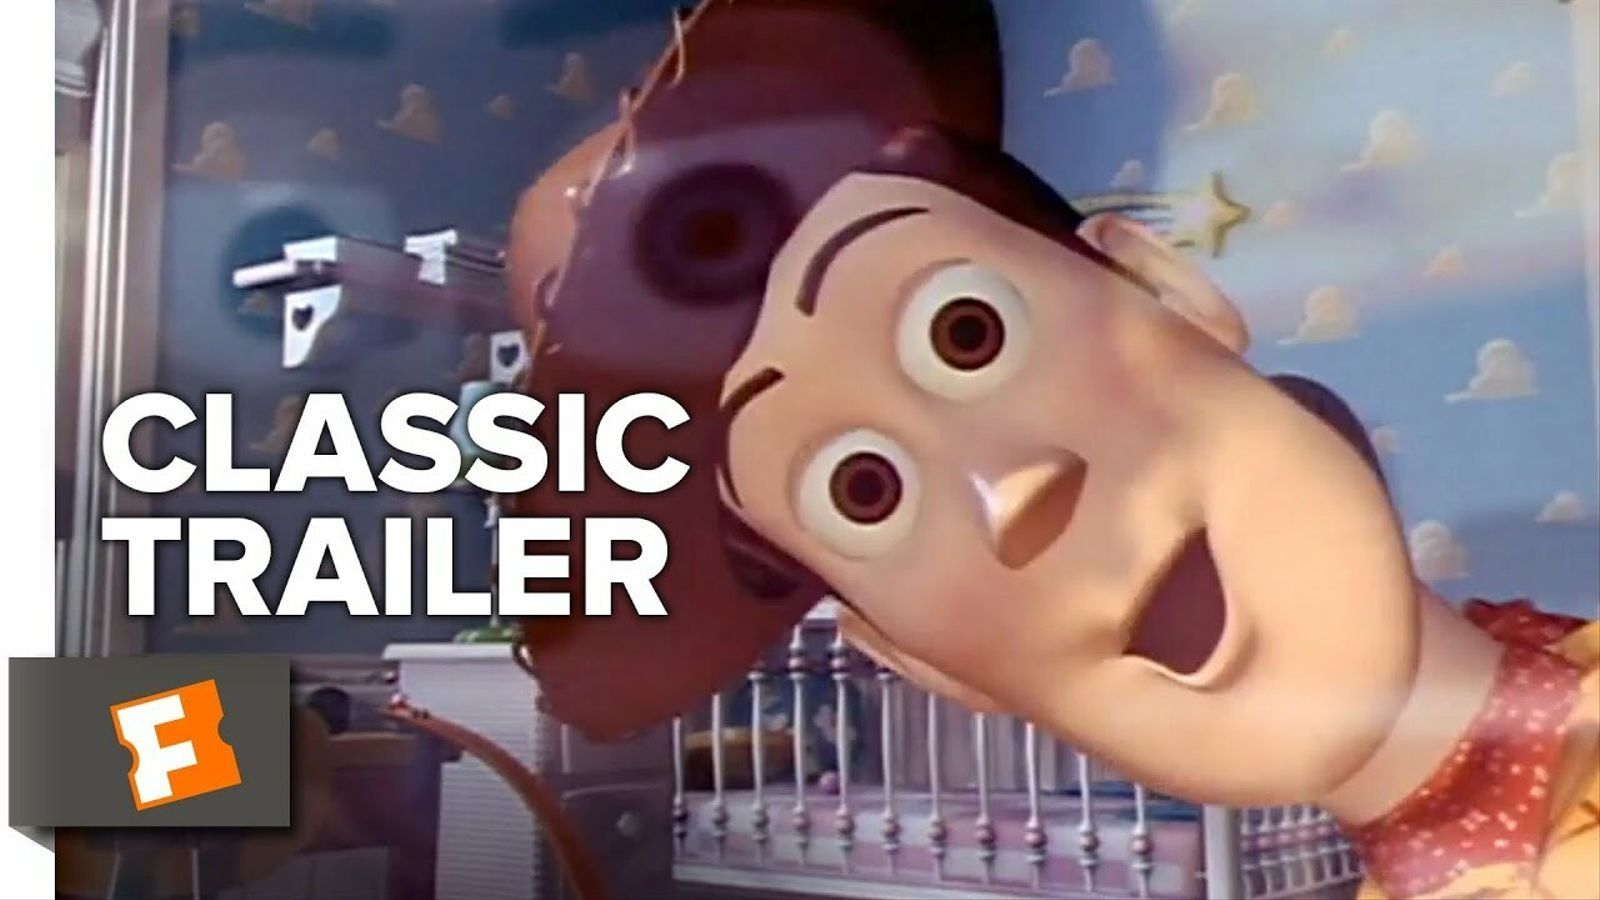 Tràiler de 'Toy Story', de John Lasseter